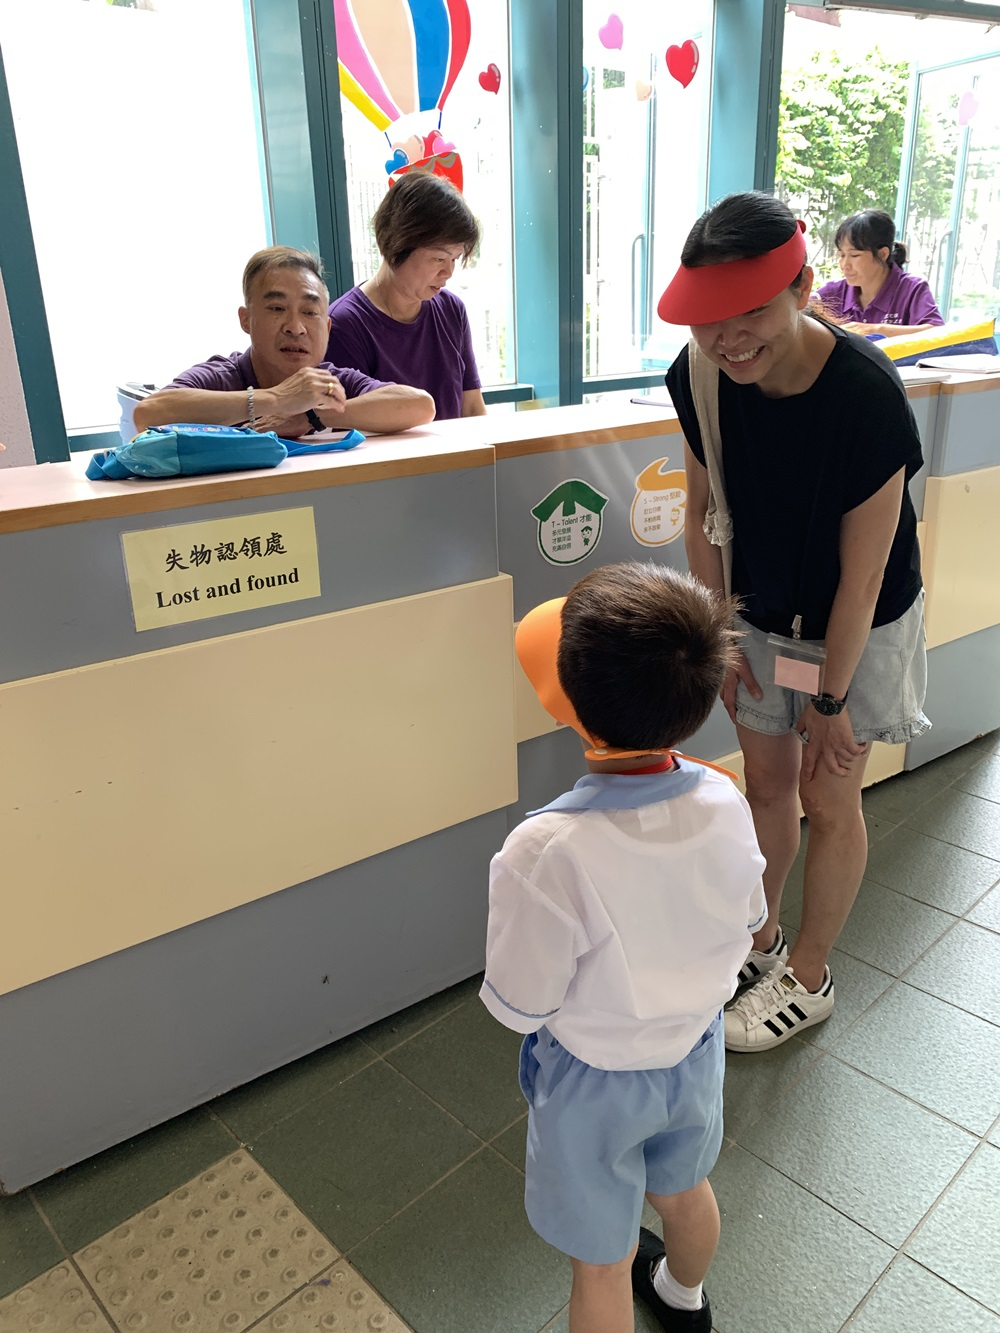 https://skhtswlo.edu.hk/sites/default/files/2019-09-27_14.15.02.jpg